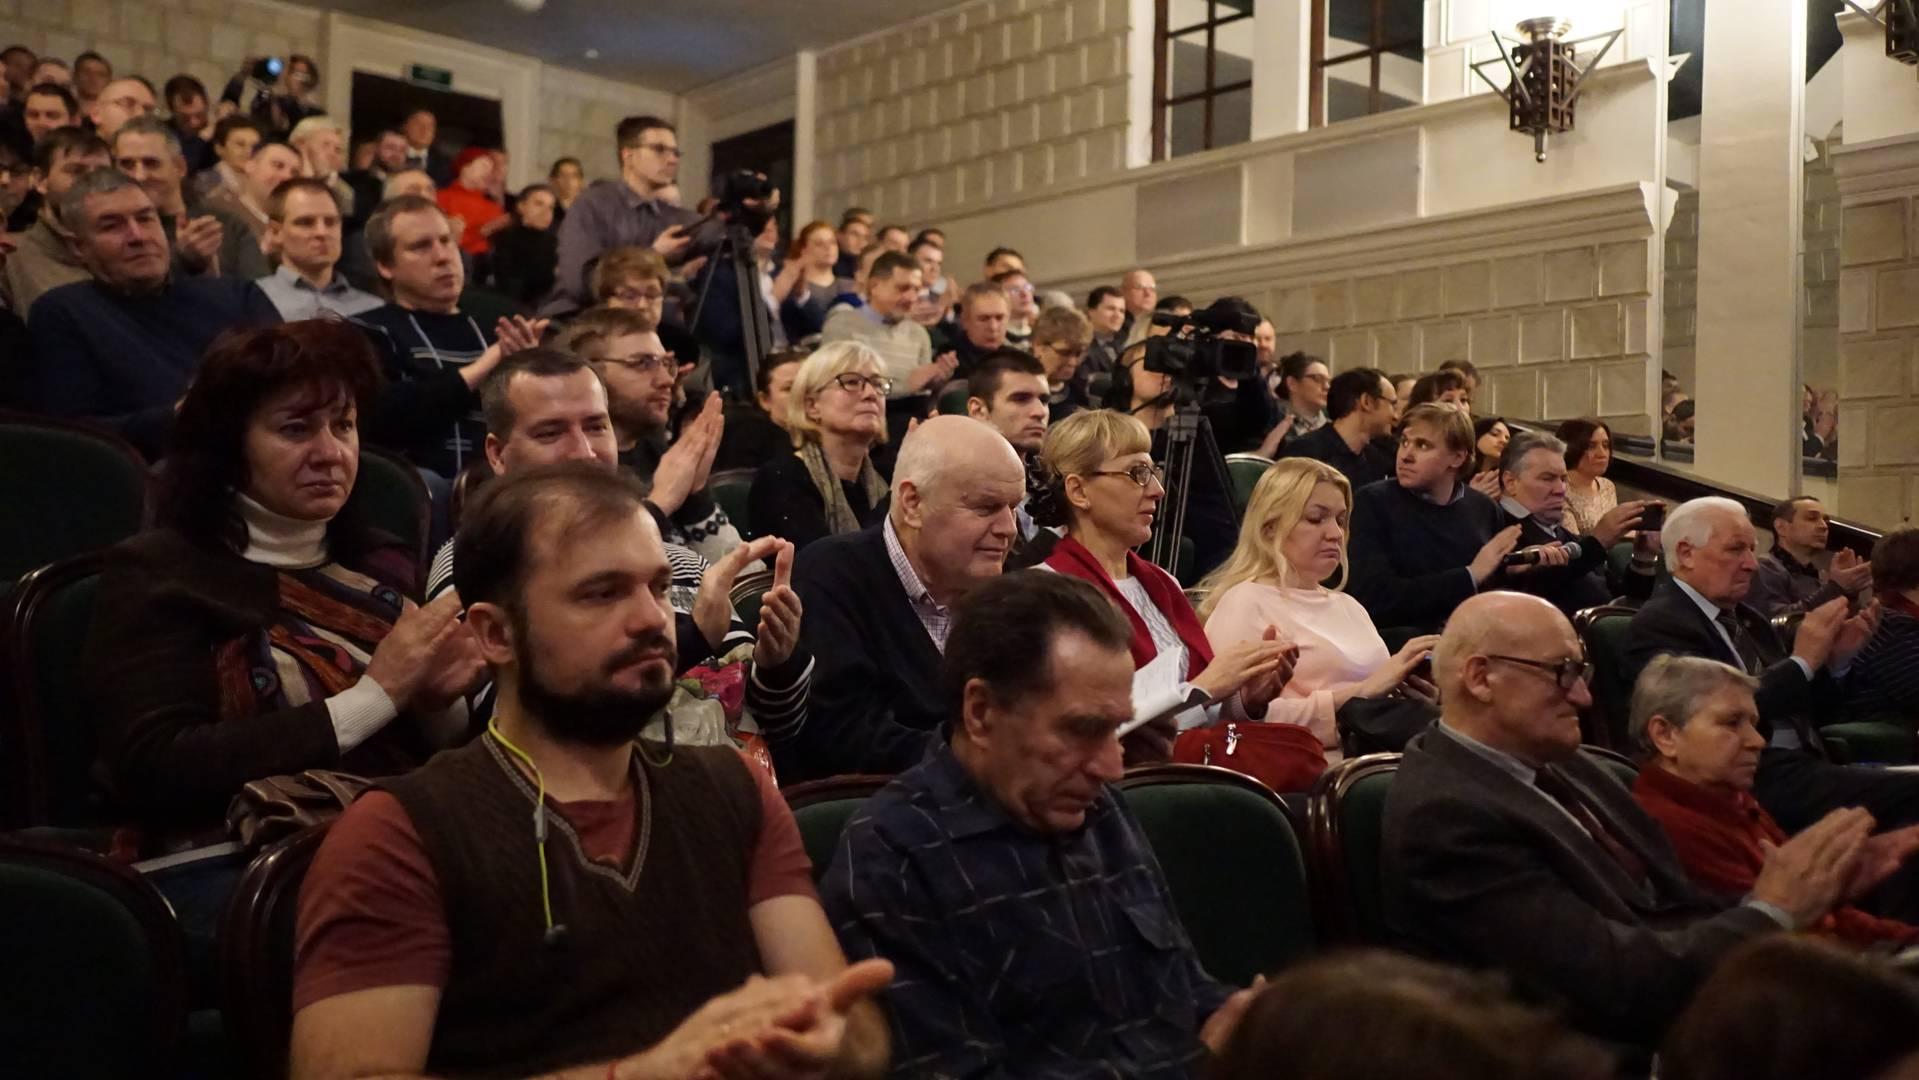 Конференция «Пенсионно-реформаторский зуд власти — последствия и риски» в Москве